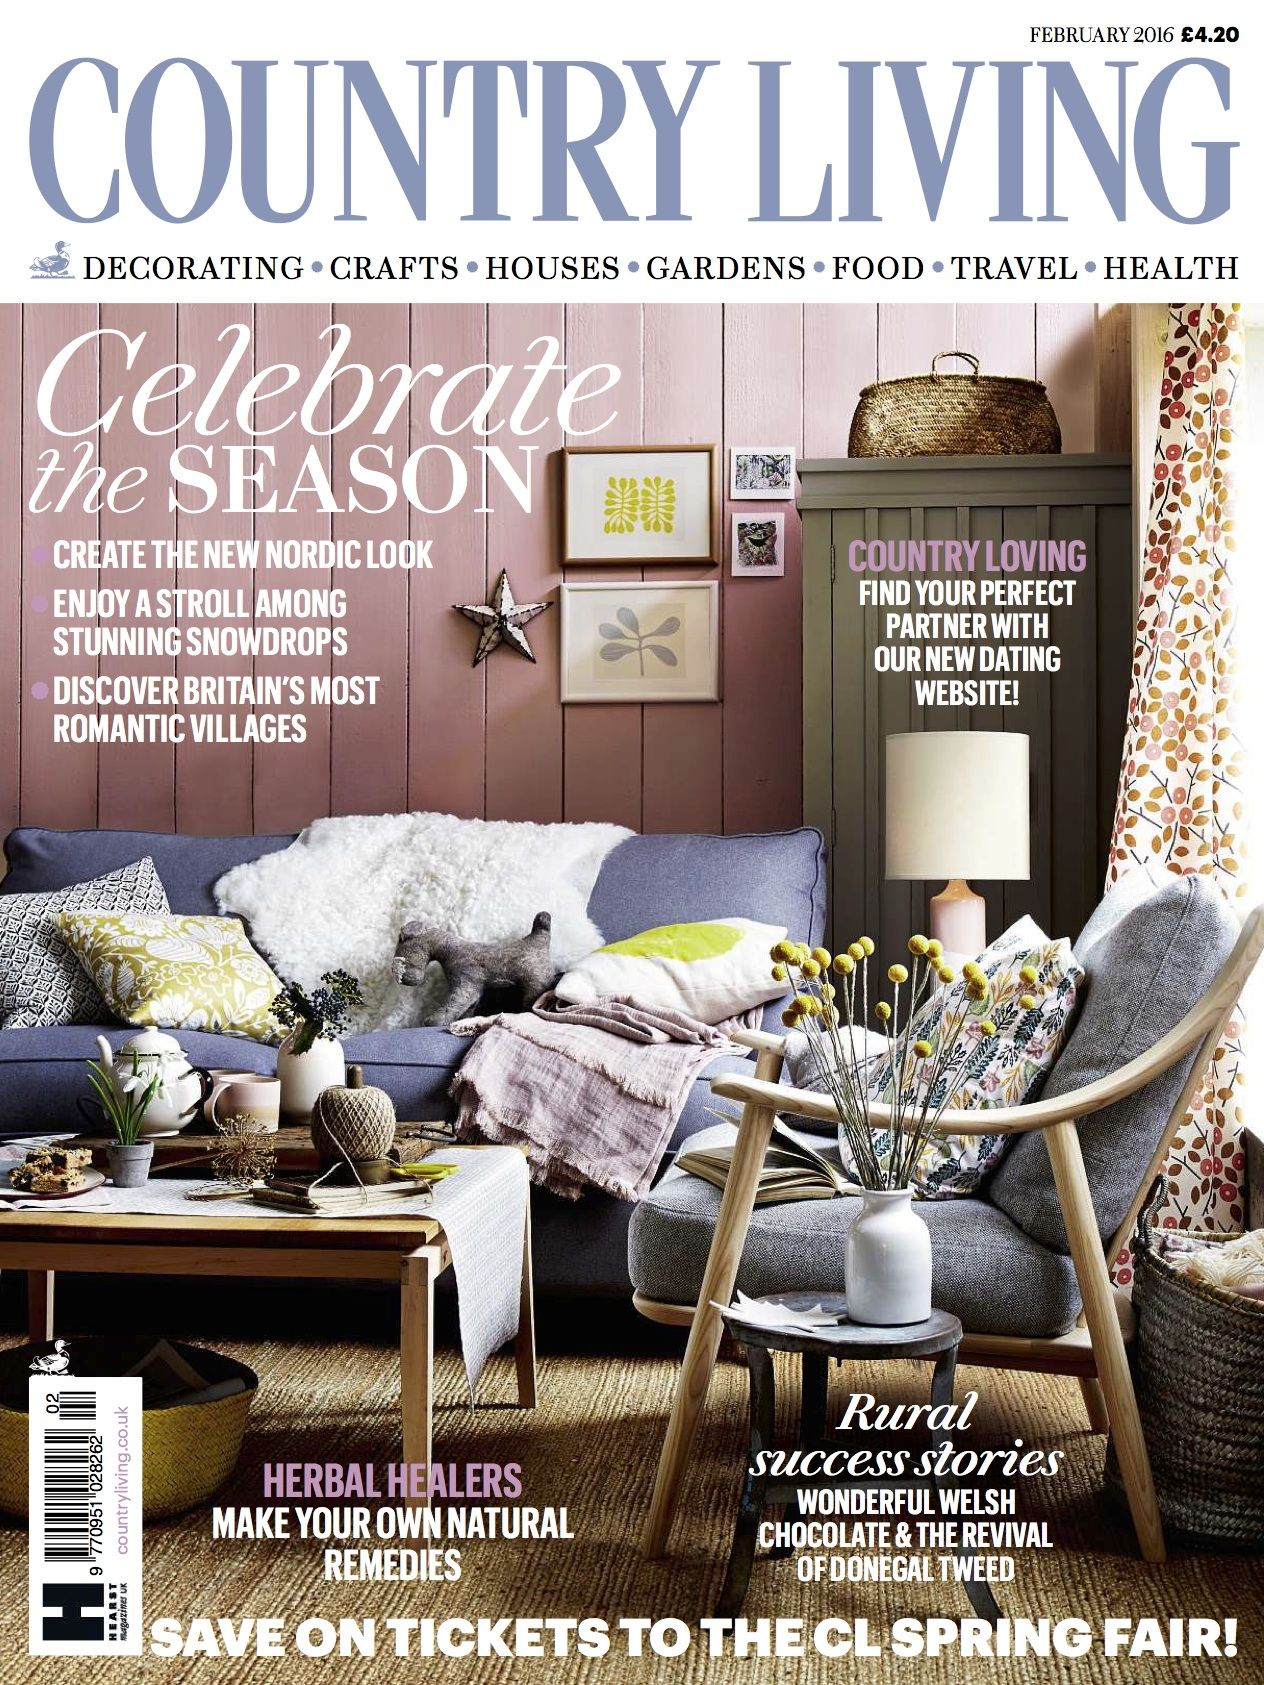 country living magazine uk february 2016 cover | england